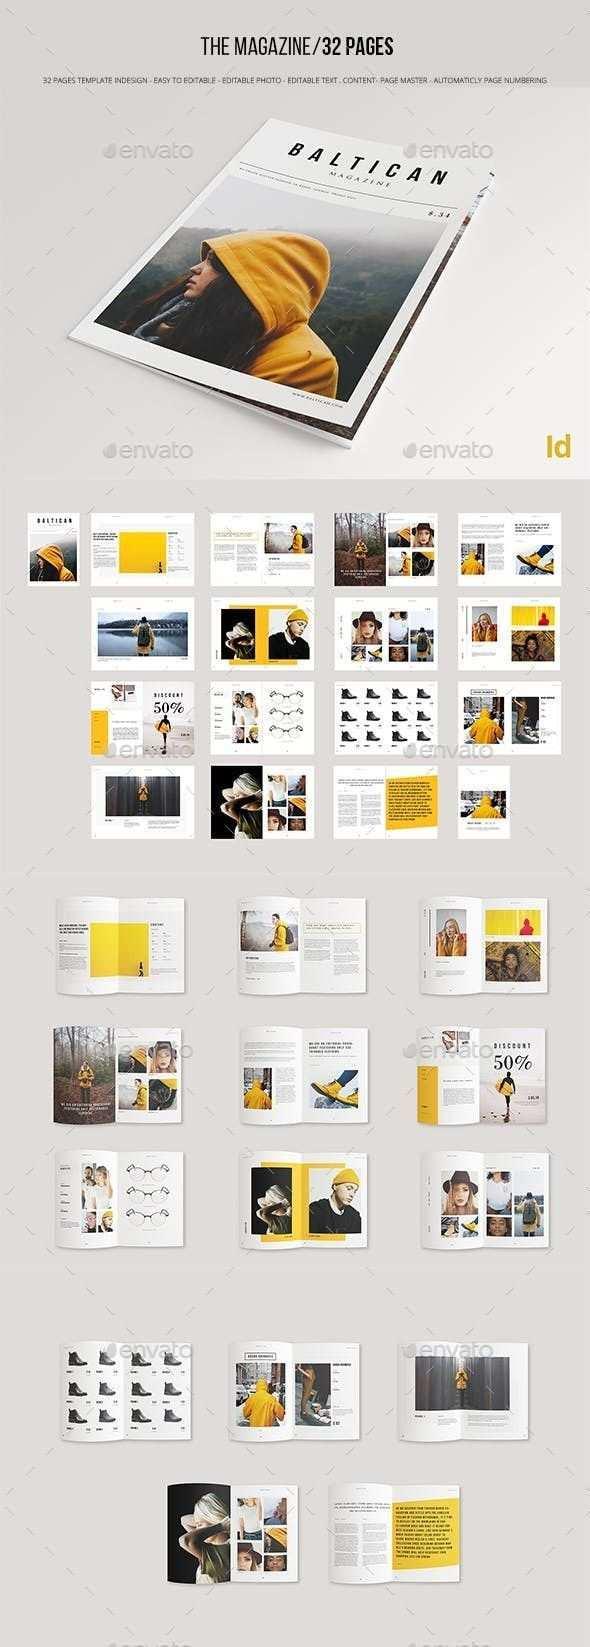 Brochure Template Indesign Indd In 2020 Layout Design Broschure Design Zeitschriften Layouts